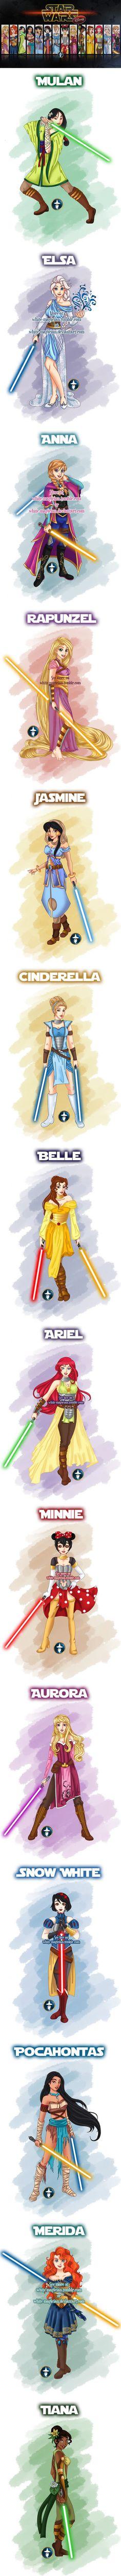 What if Disney Princesses were Star Wars Jedis (by White-Magician) #disneyprincess #disneyprincesspics #disney